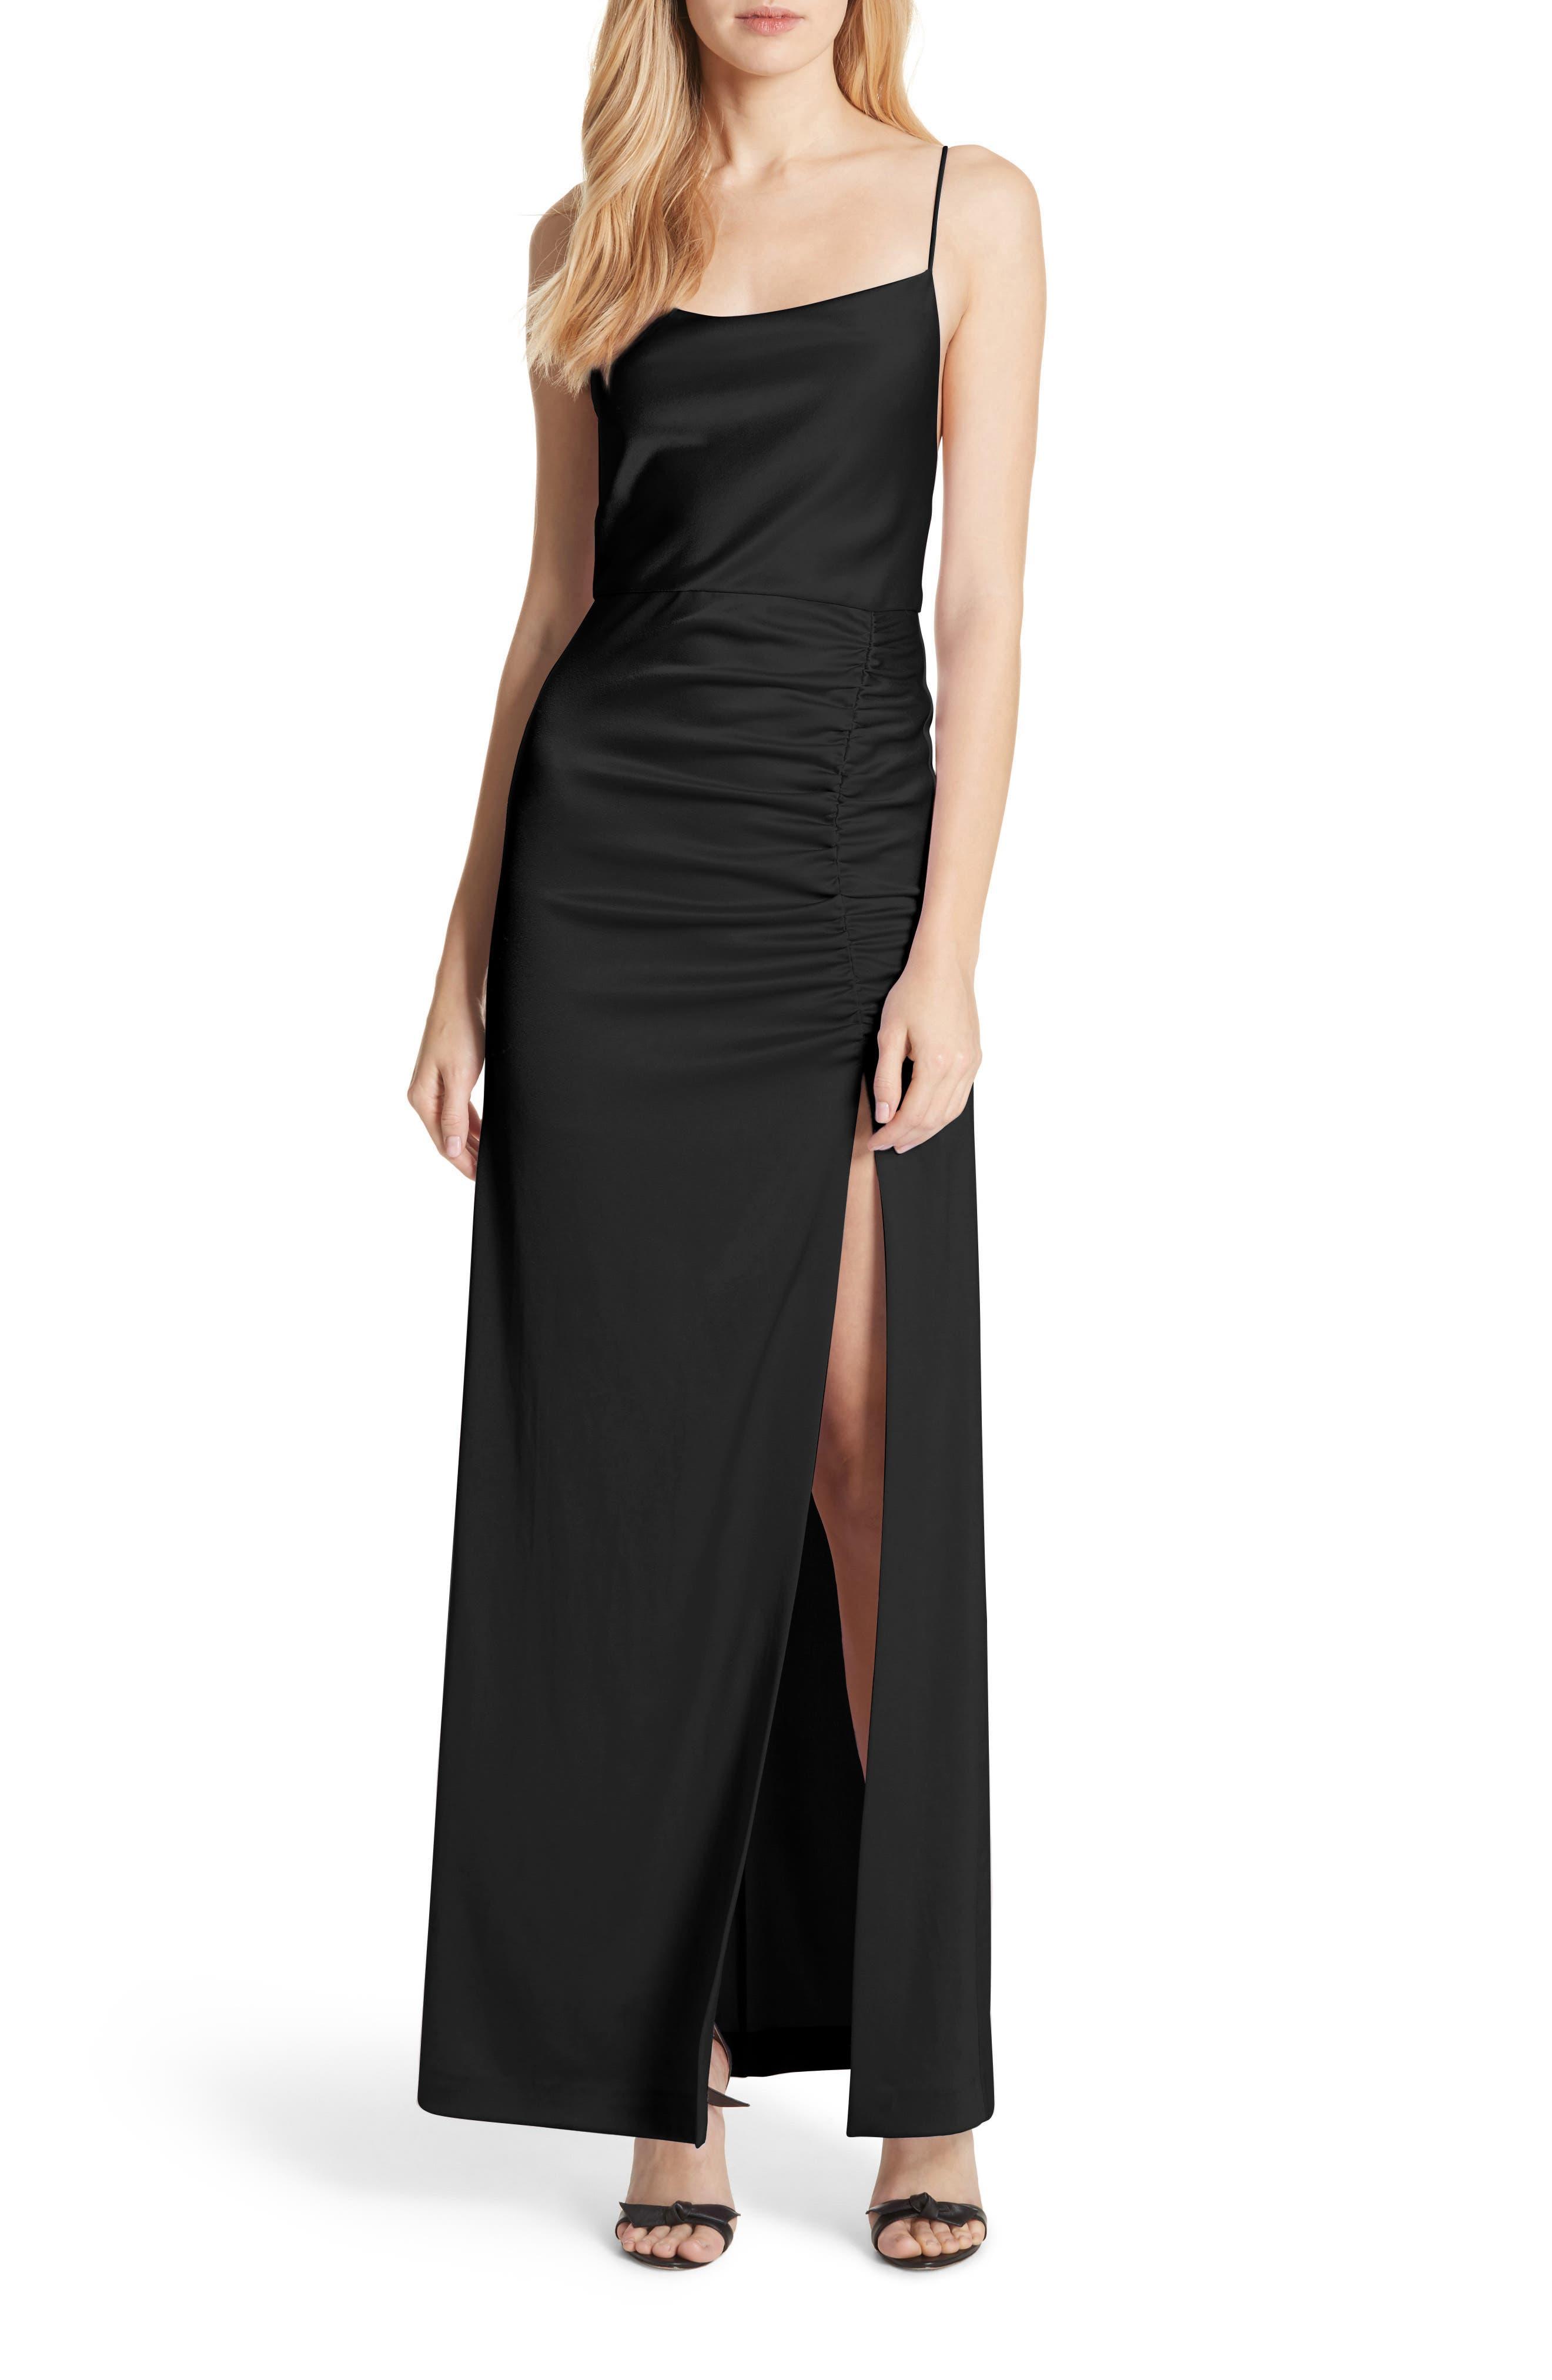 Diana Slit Front Maxi Dress,                             Main thumbnail 1, color,                             Black